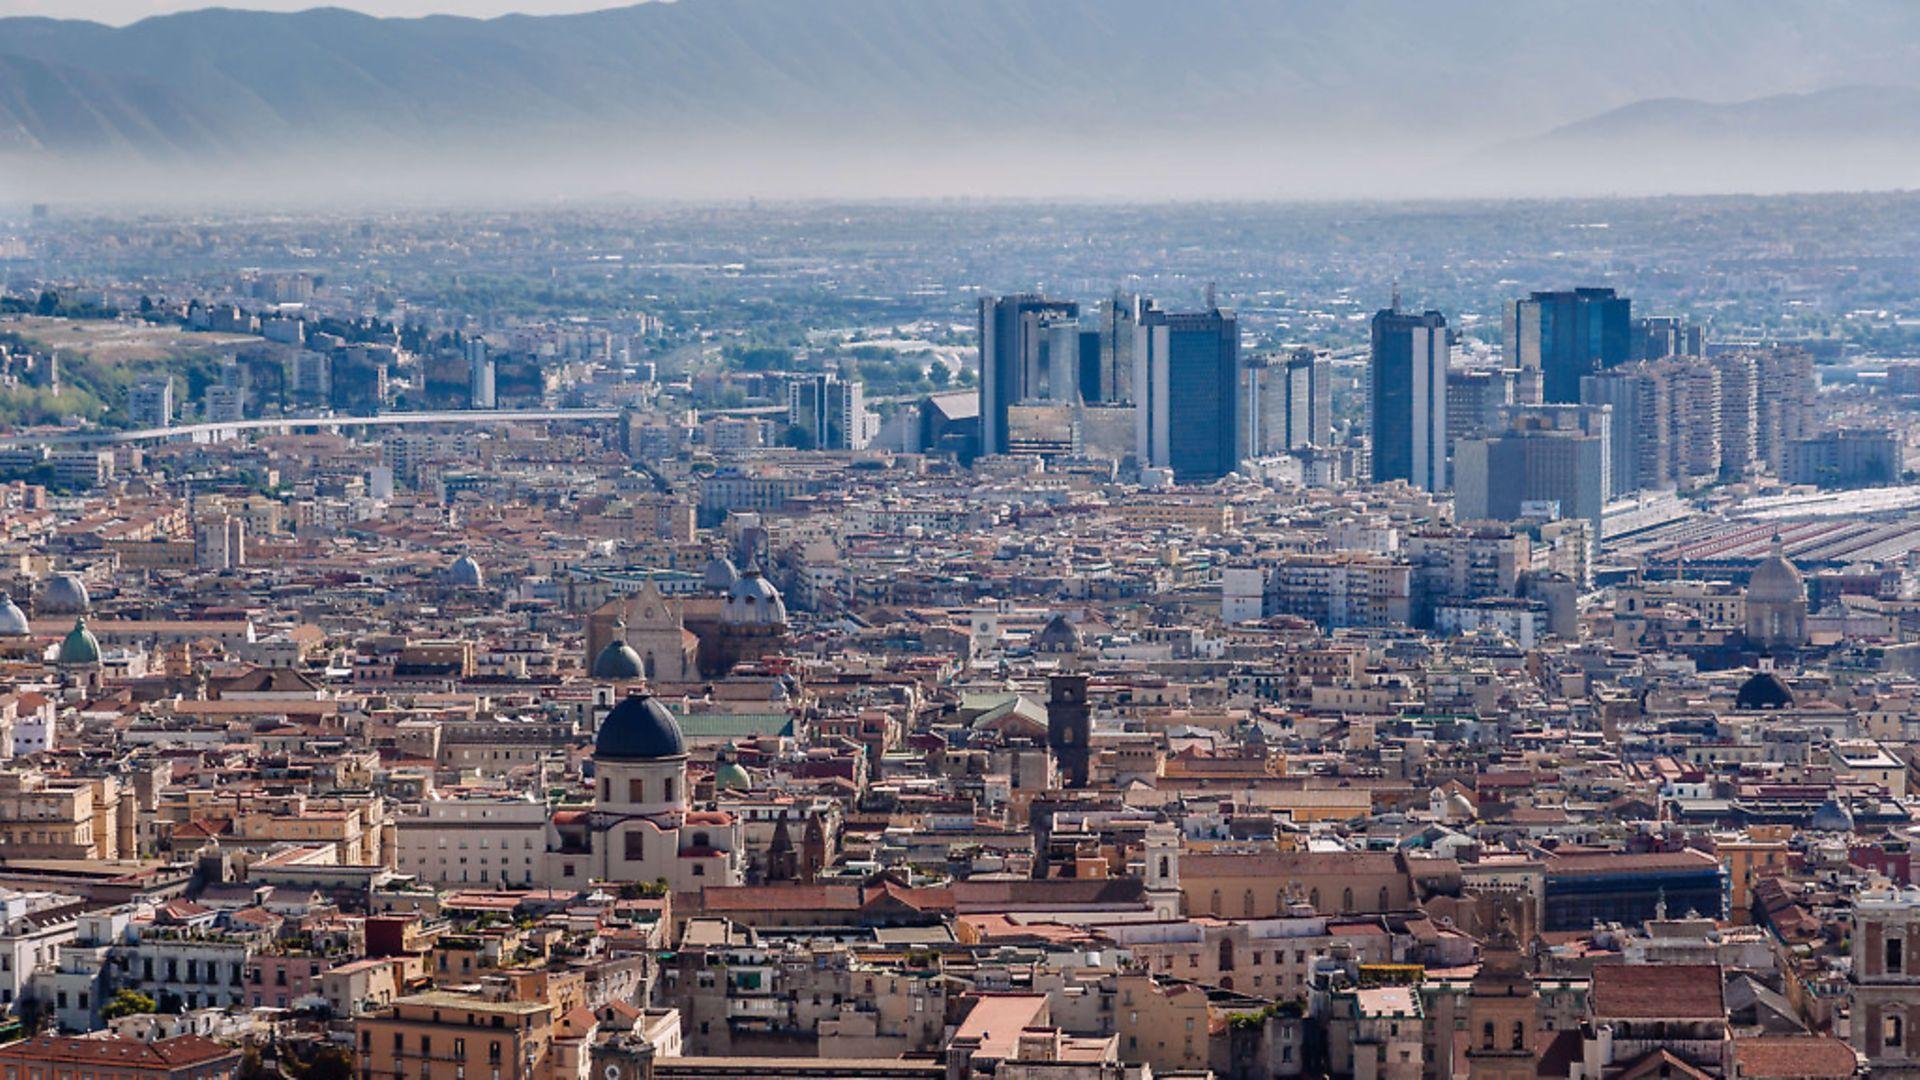 City skyline from Castel Sant'Elmo. (Photo by Raquel Maria Carbonell Pagola/LightRocket via Getty Images) - Credit: LightRocket via Getty Images